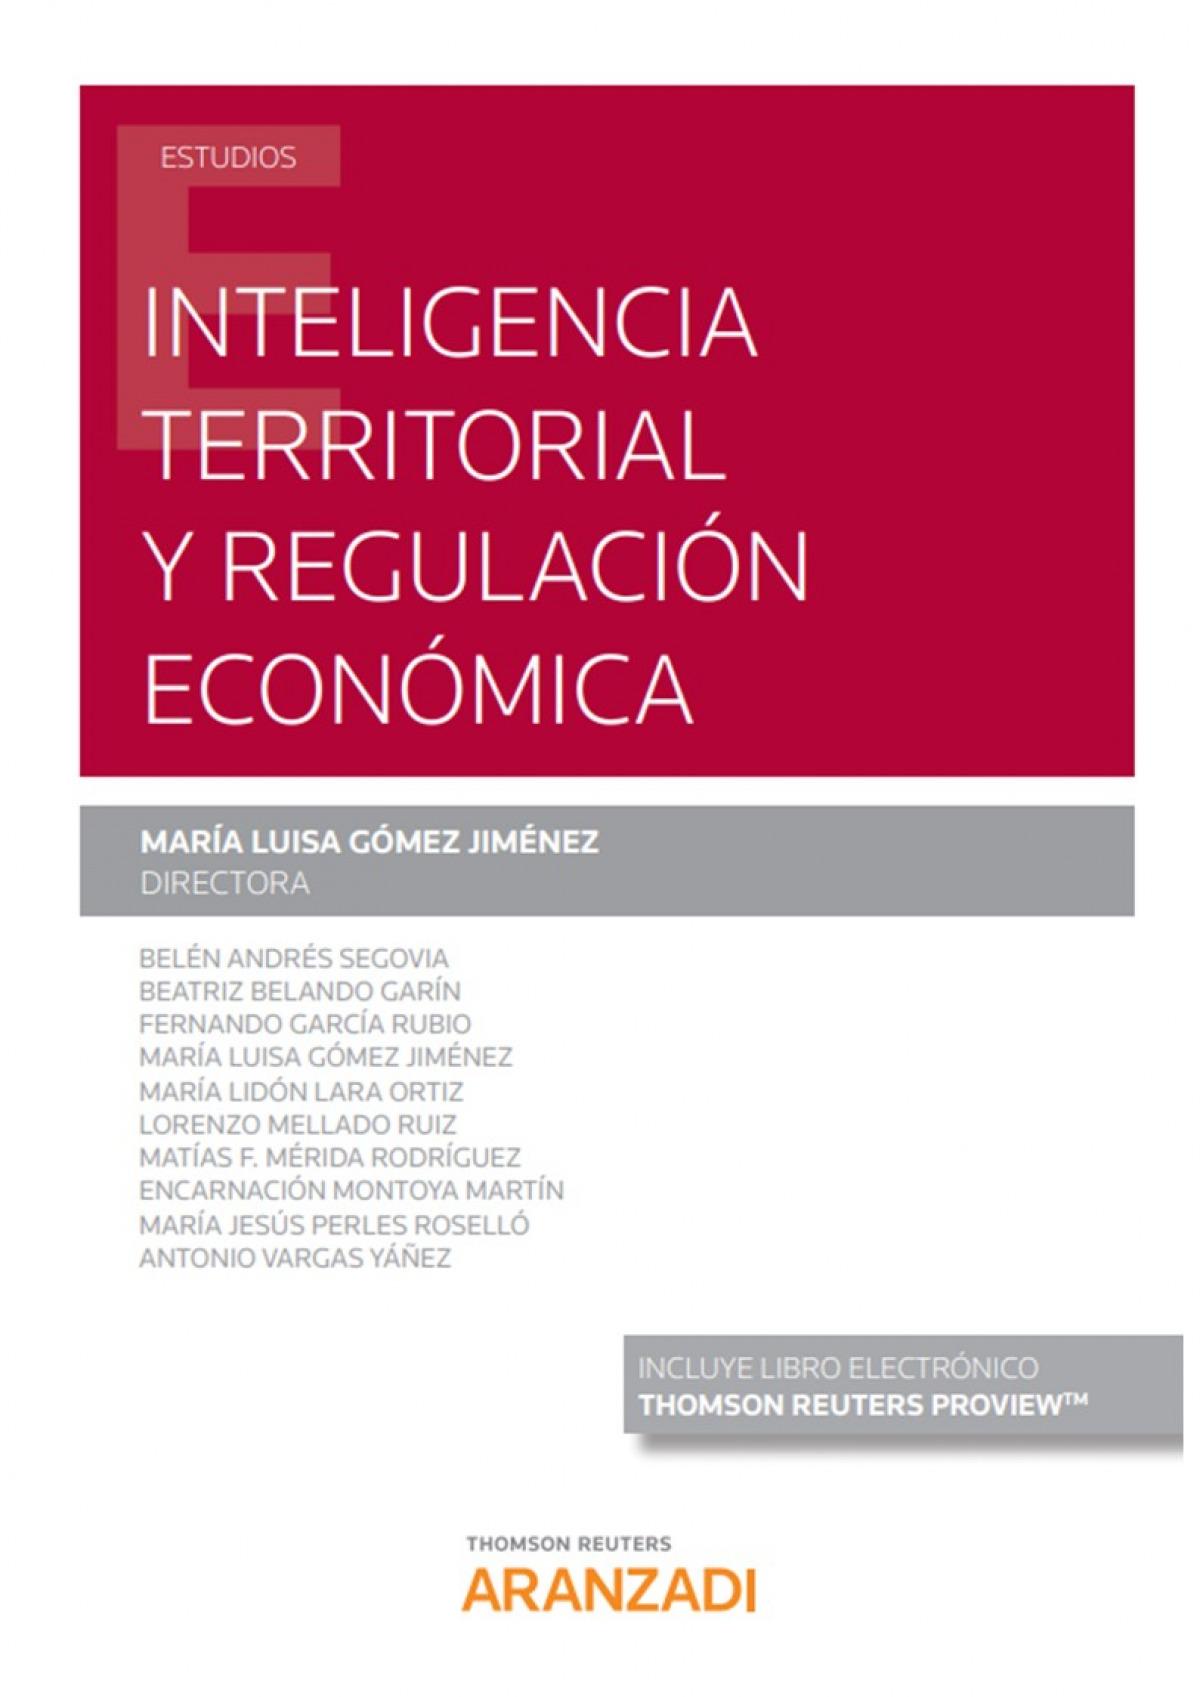 Inteligencia Territorial y Regulación Económica (Papel + e-book) 9788413469317